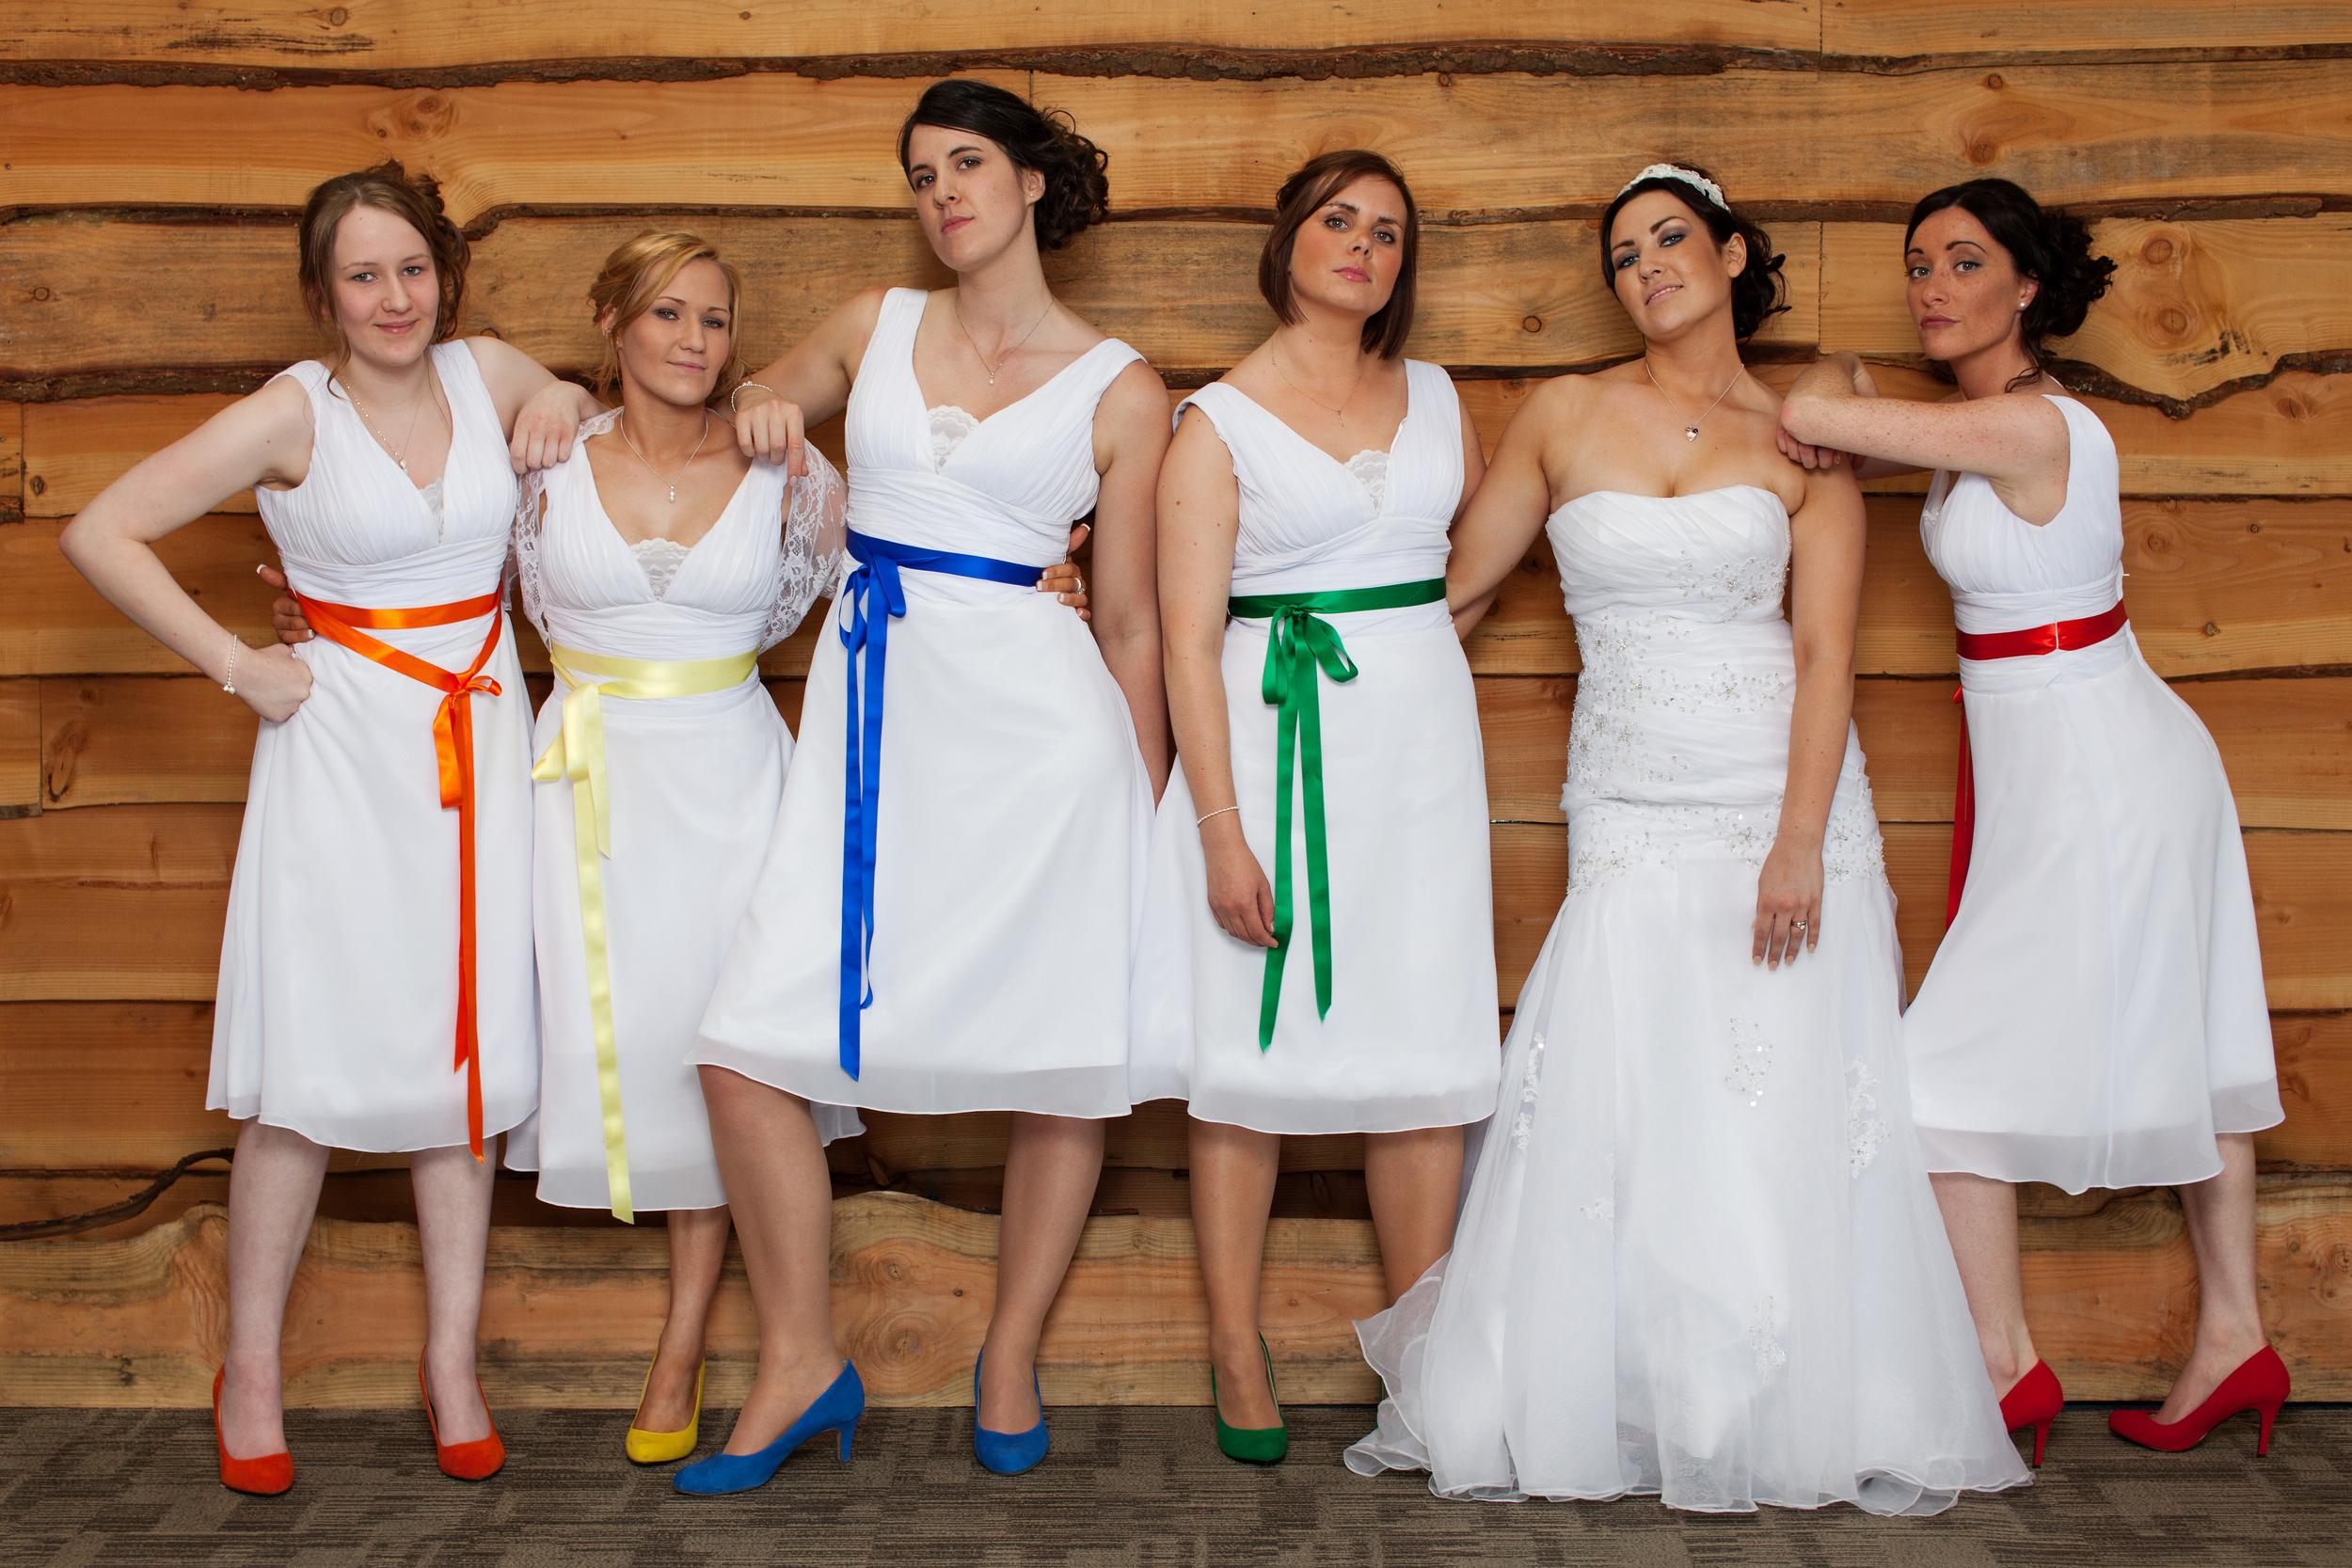 Bridemaids-2-20140510-IMG_1200-full-res.jpg